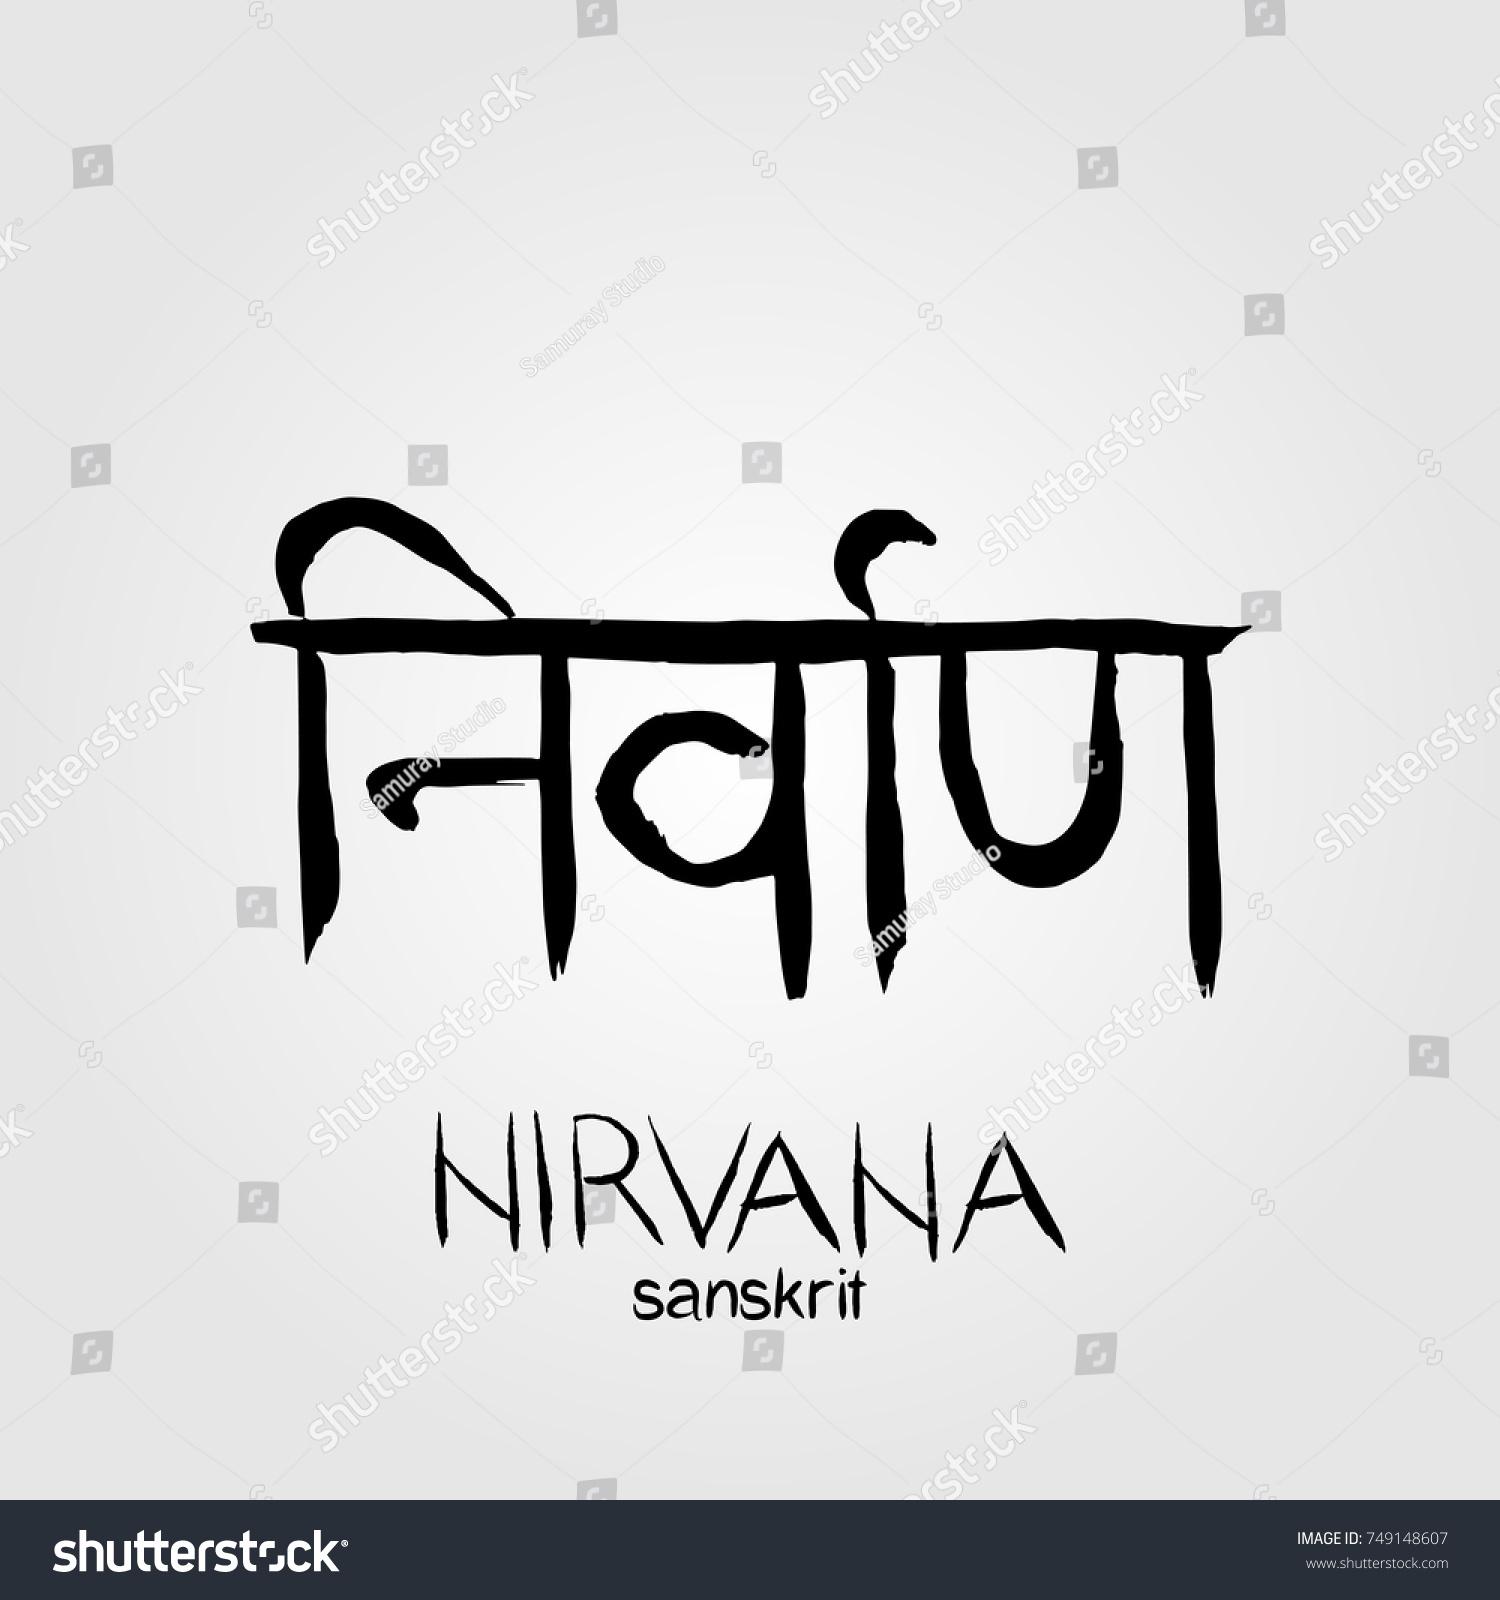 Sanskrit Hand Drawn Calligraphy Font Nirvana Stock Vector 749148607